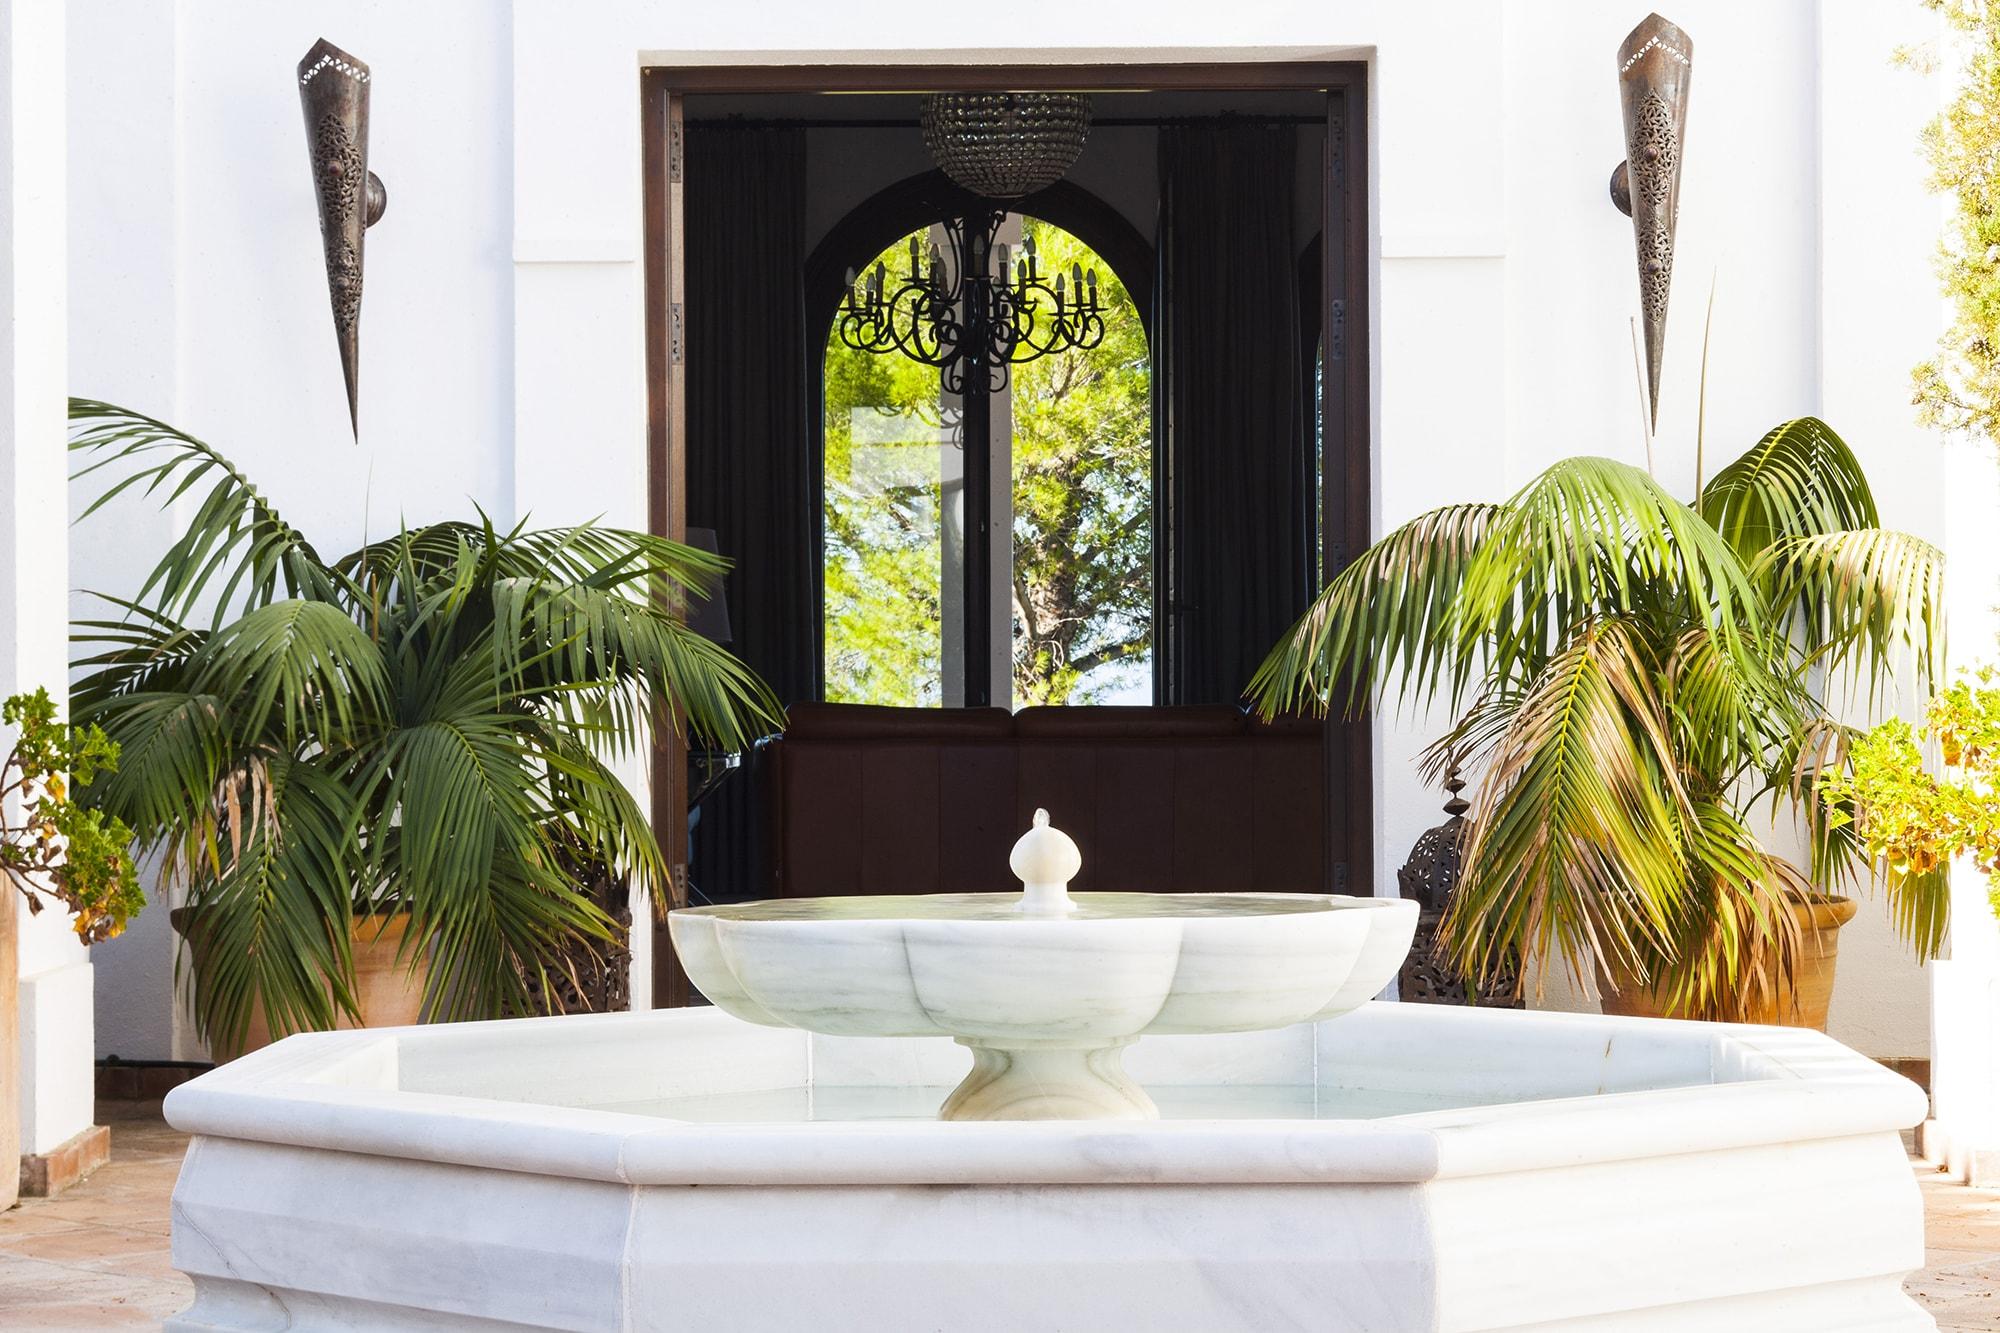 courtyard at luxury villa spain